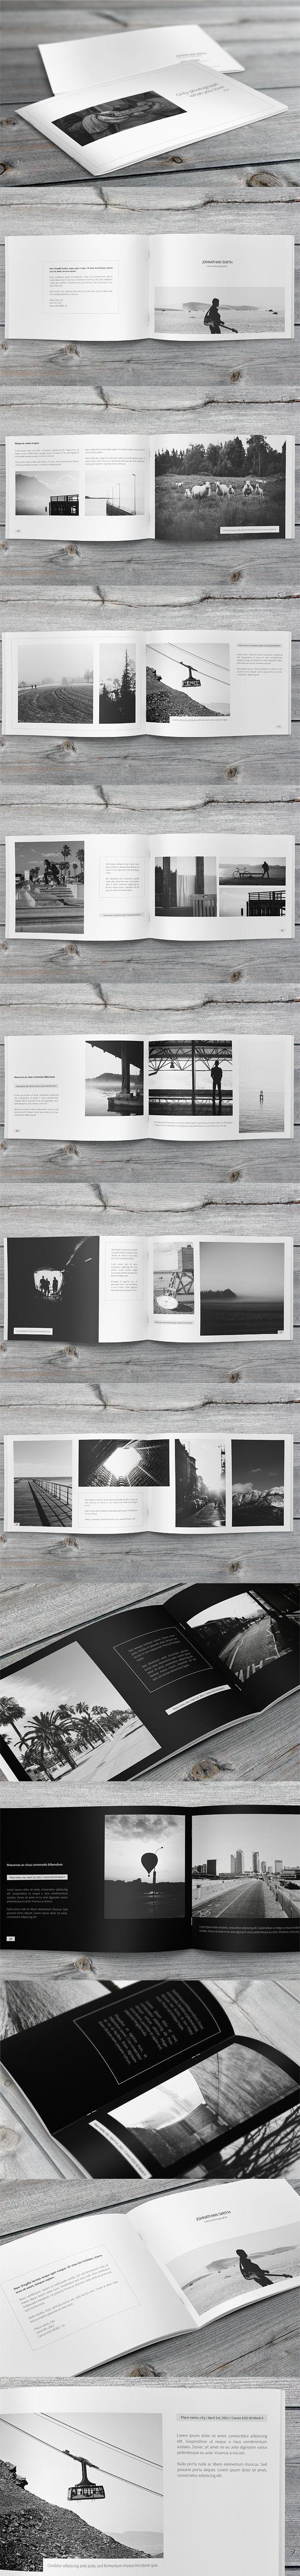 Minimalfolio Photography Portfolio A4 Brochure #4 on Behance